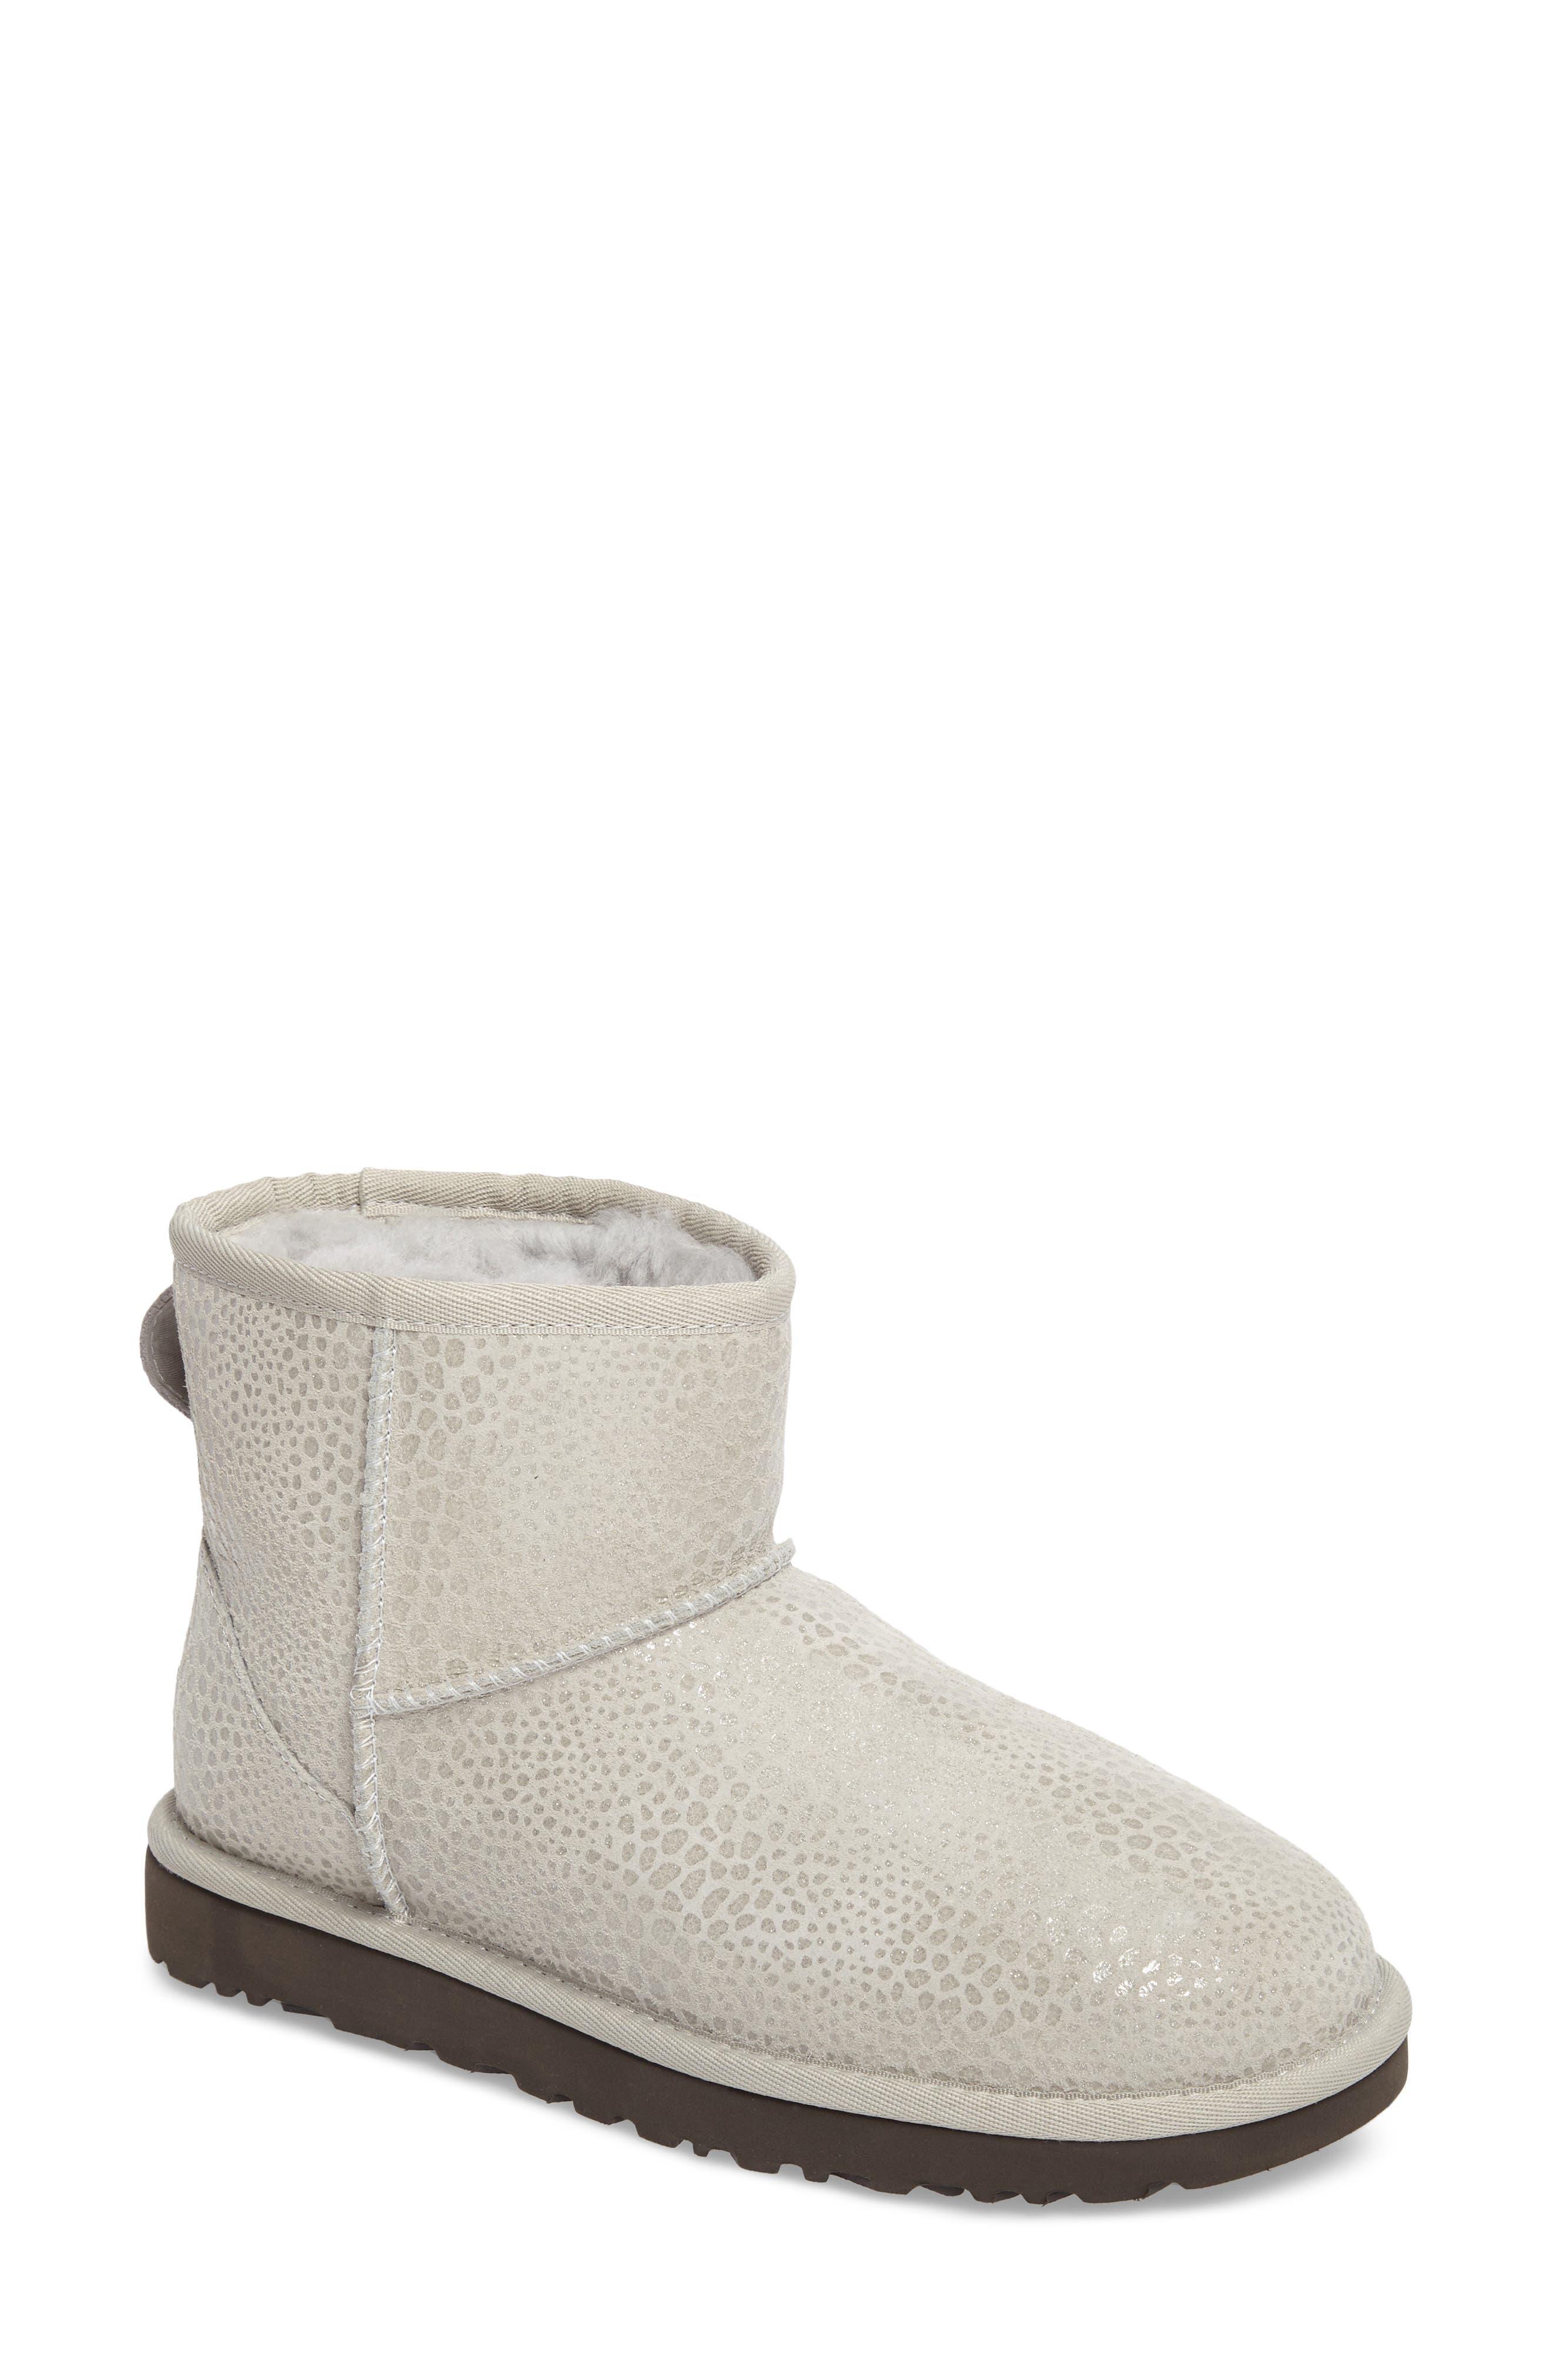 Main Image - UGG® Mini Glitzy Boot (Women)